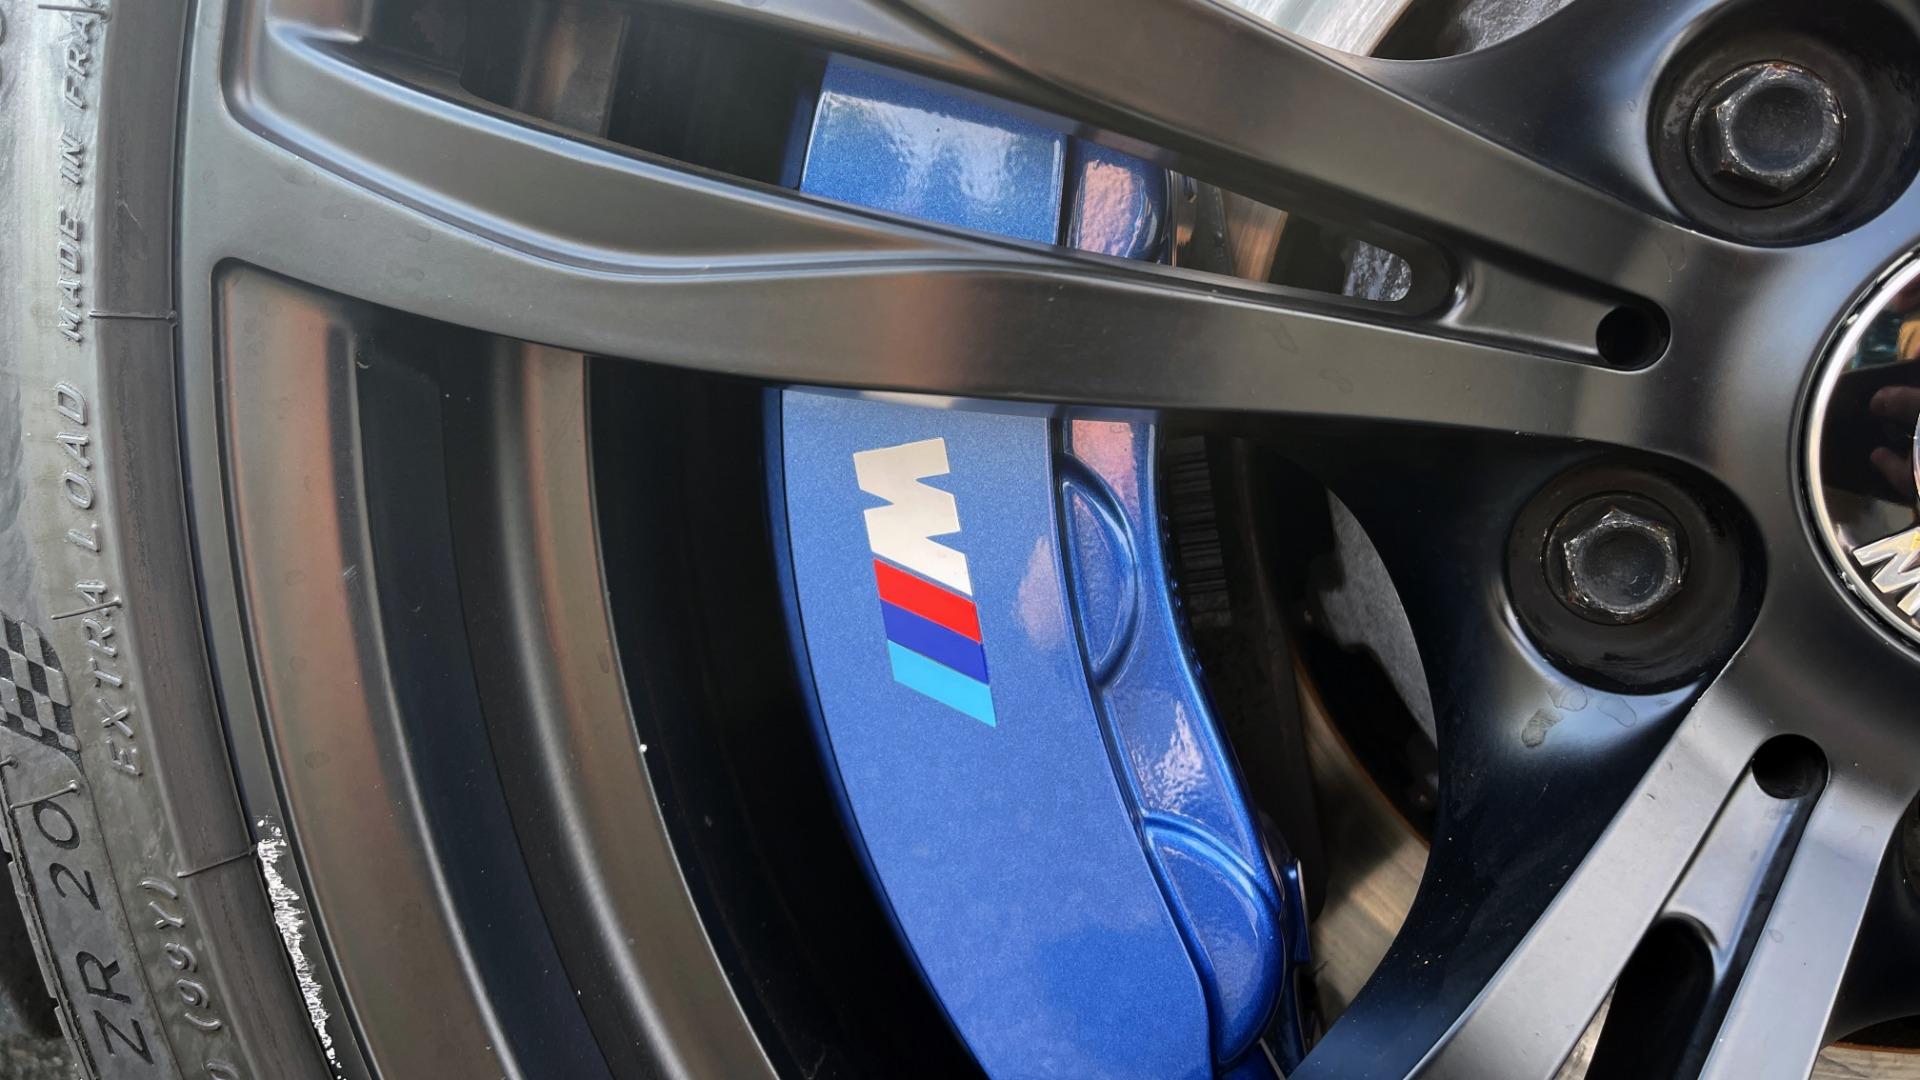 Used 2015 BMW M5 SEDAN / EXEC PKG / HUD / NAV / B&O SND / SUNROOF / REARVIEW for sale Sold at Formula Imports in Charlotte NC 28227 35